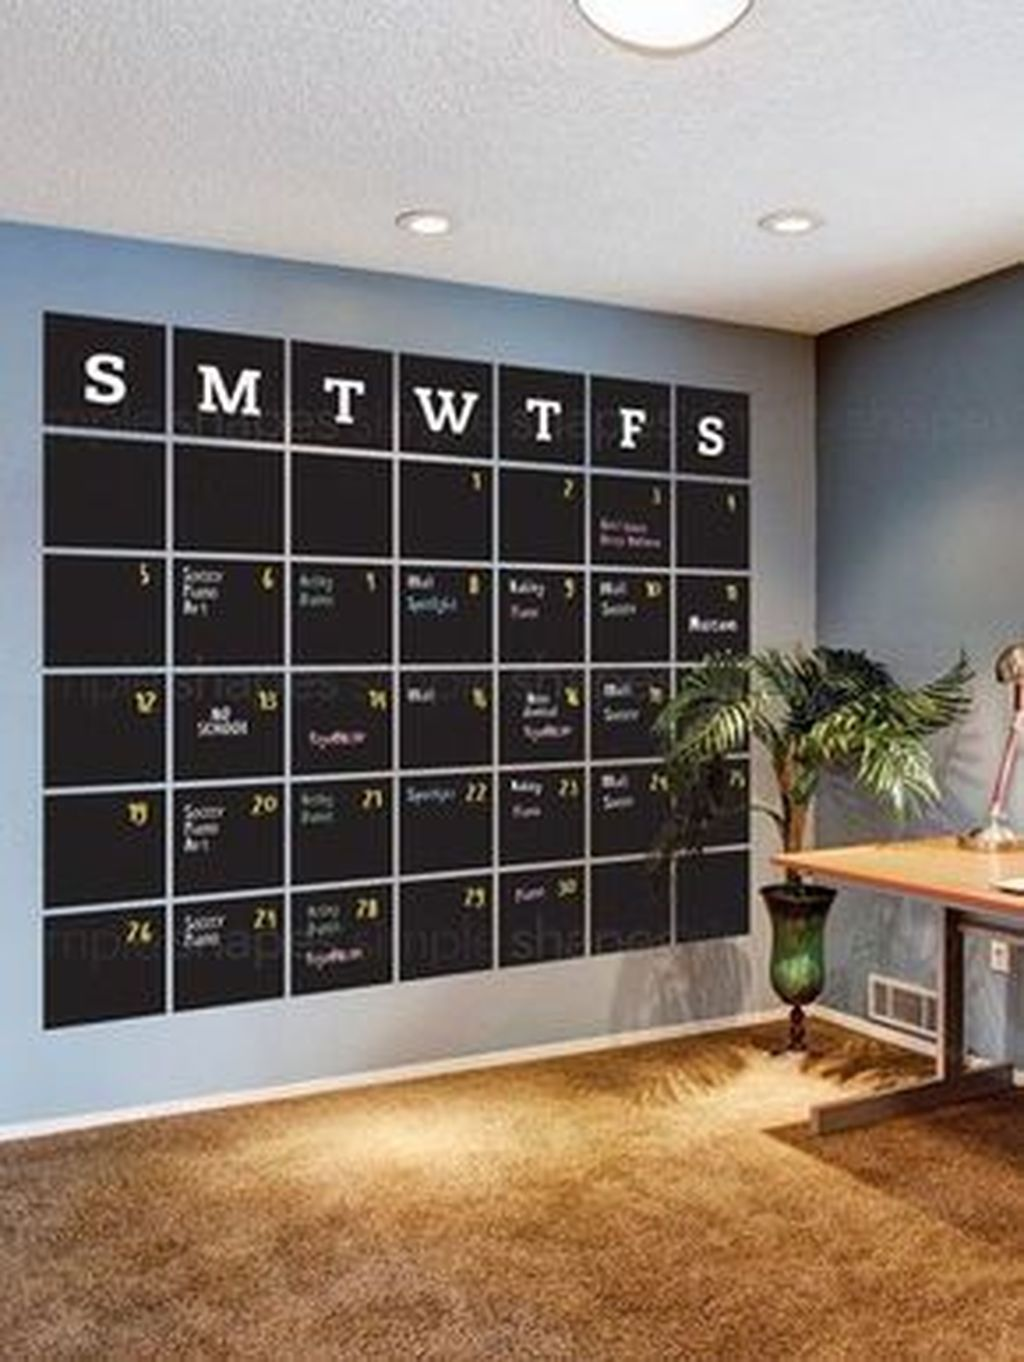 The Best Office Artwork Design Ideas 28